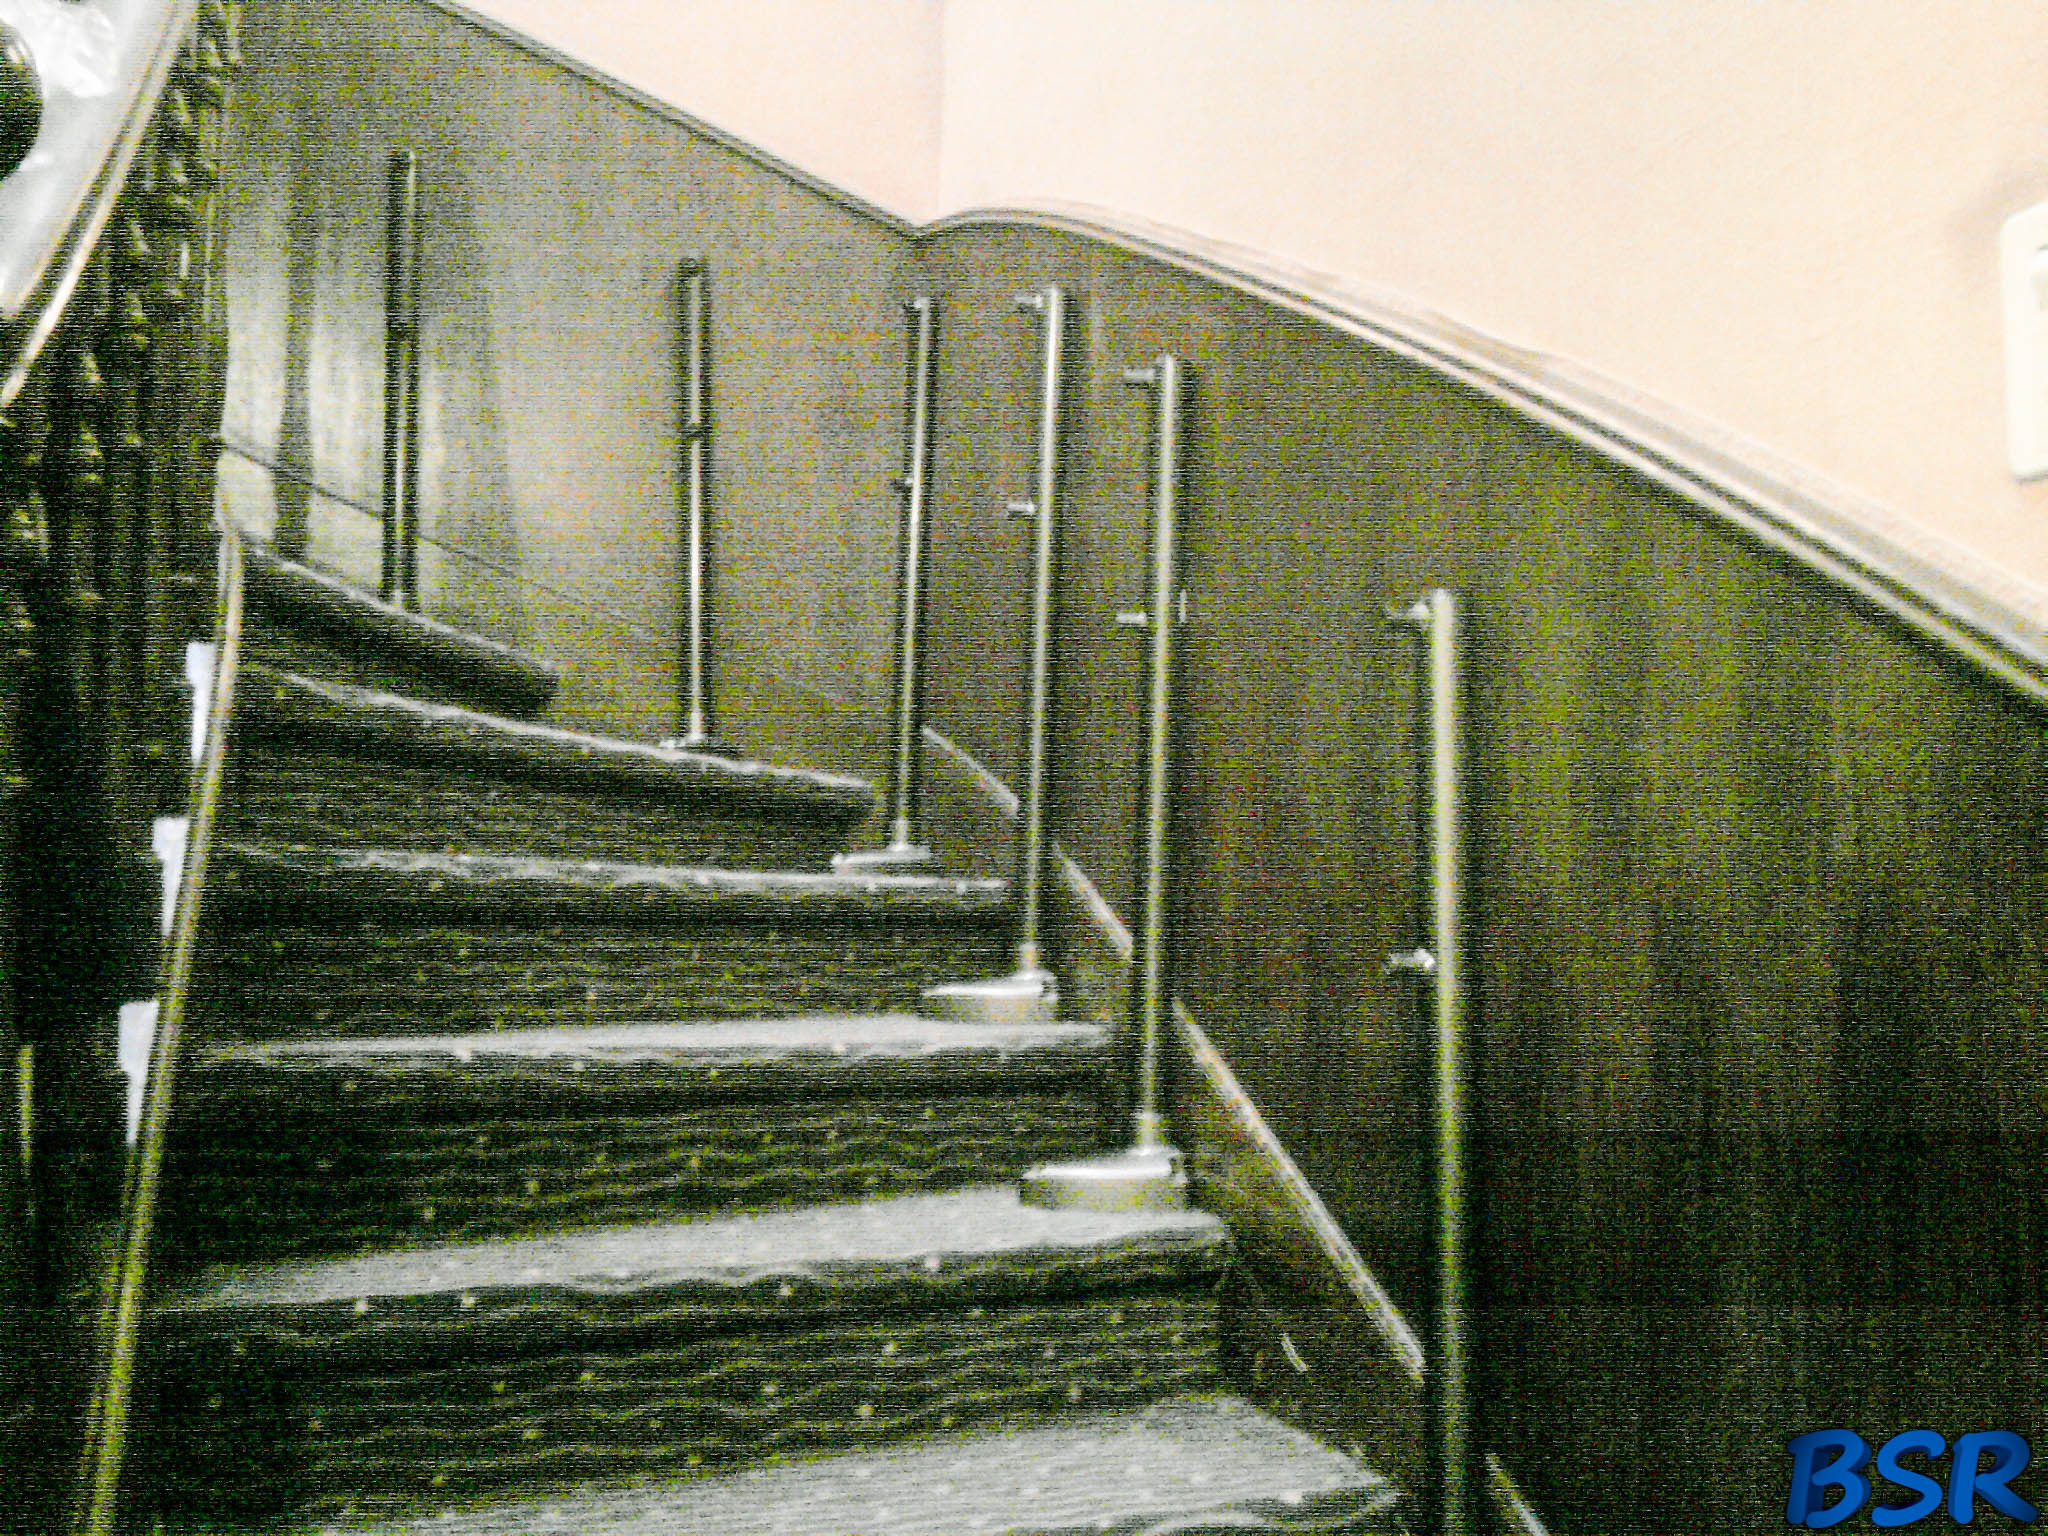 Monte Escalier BSR 013